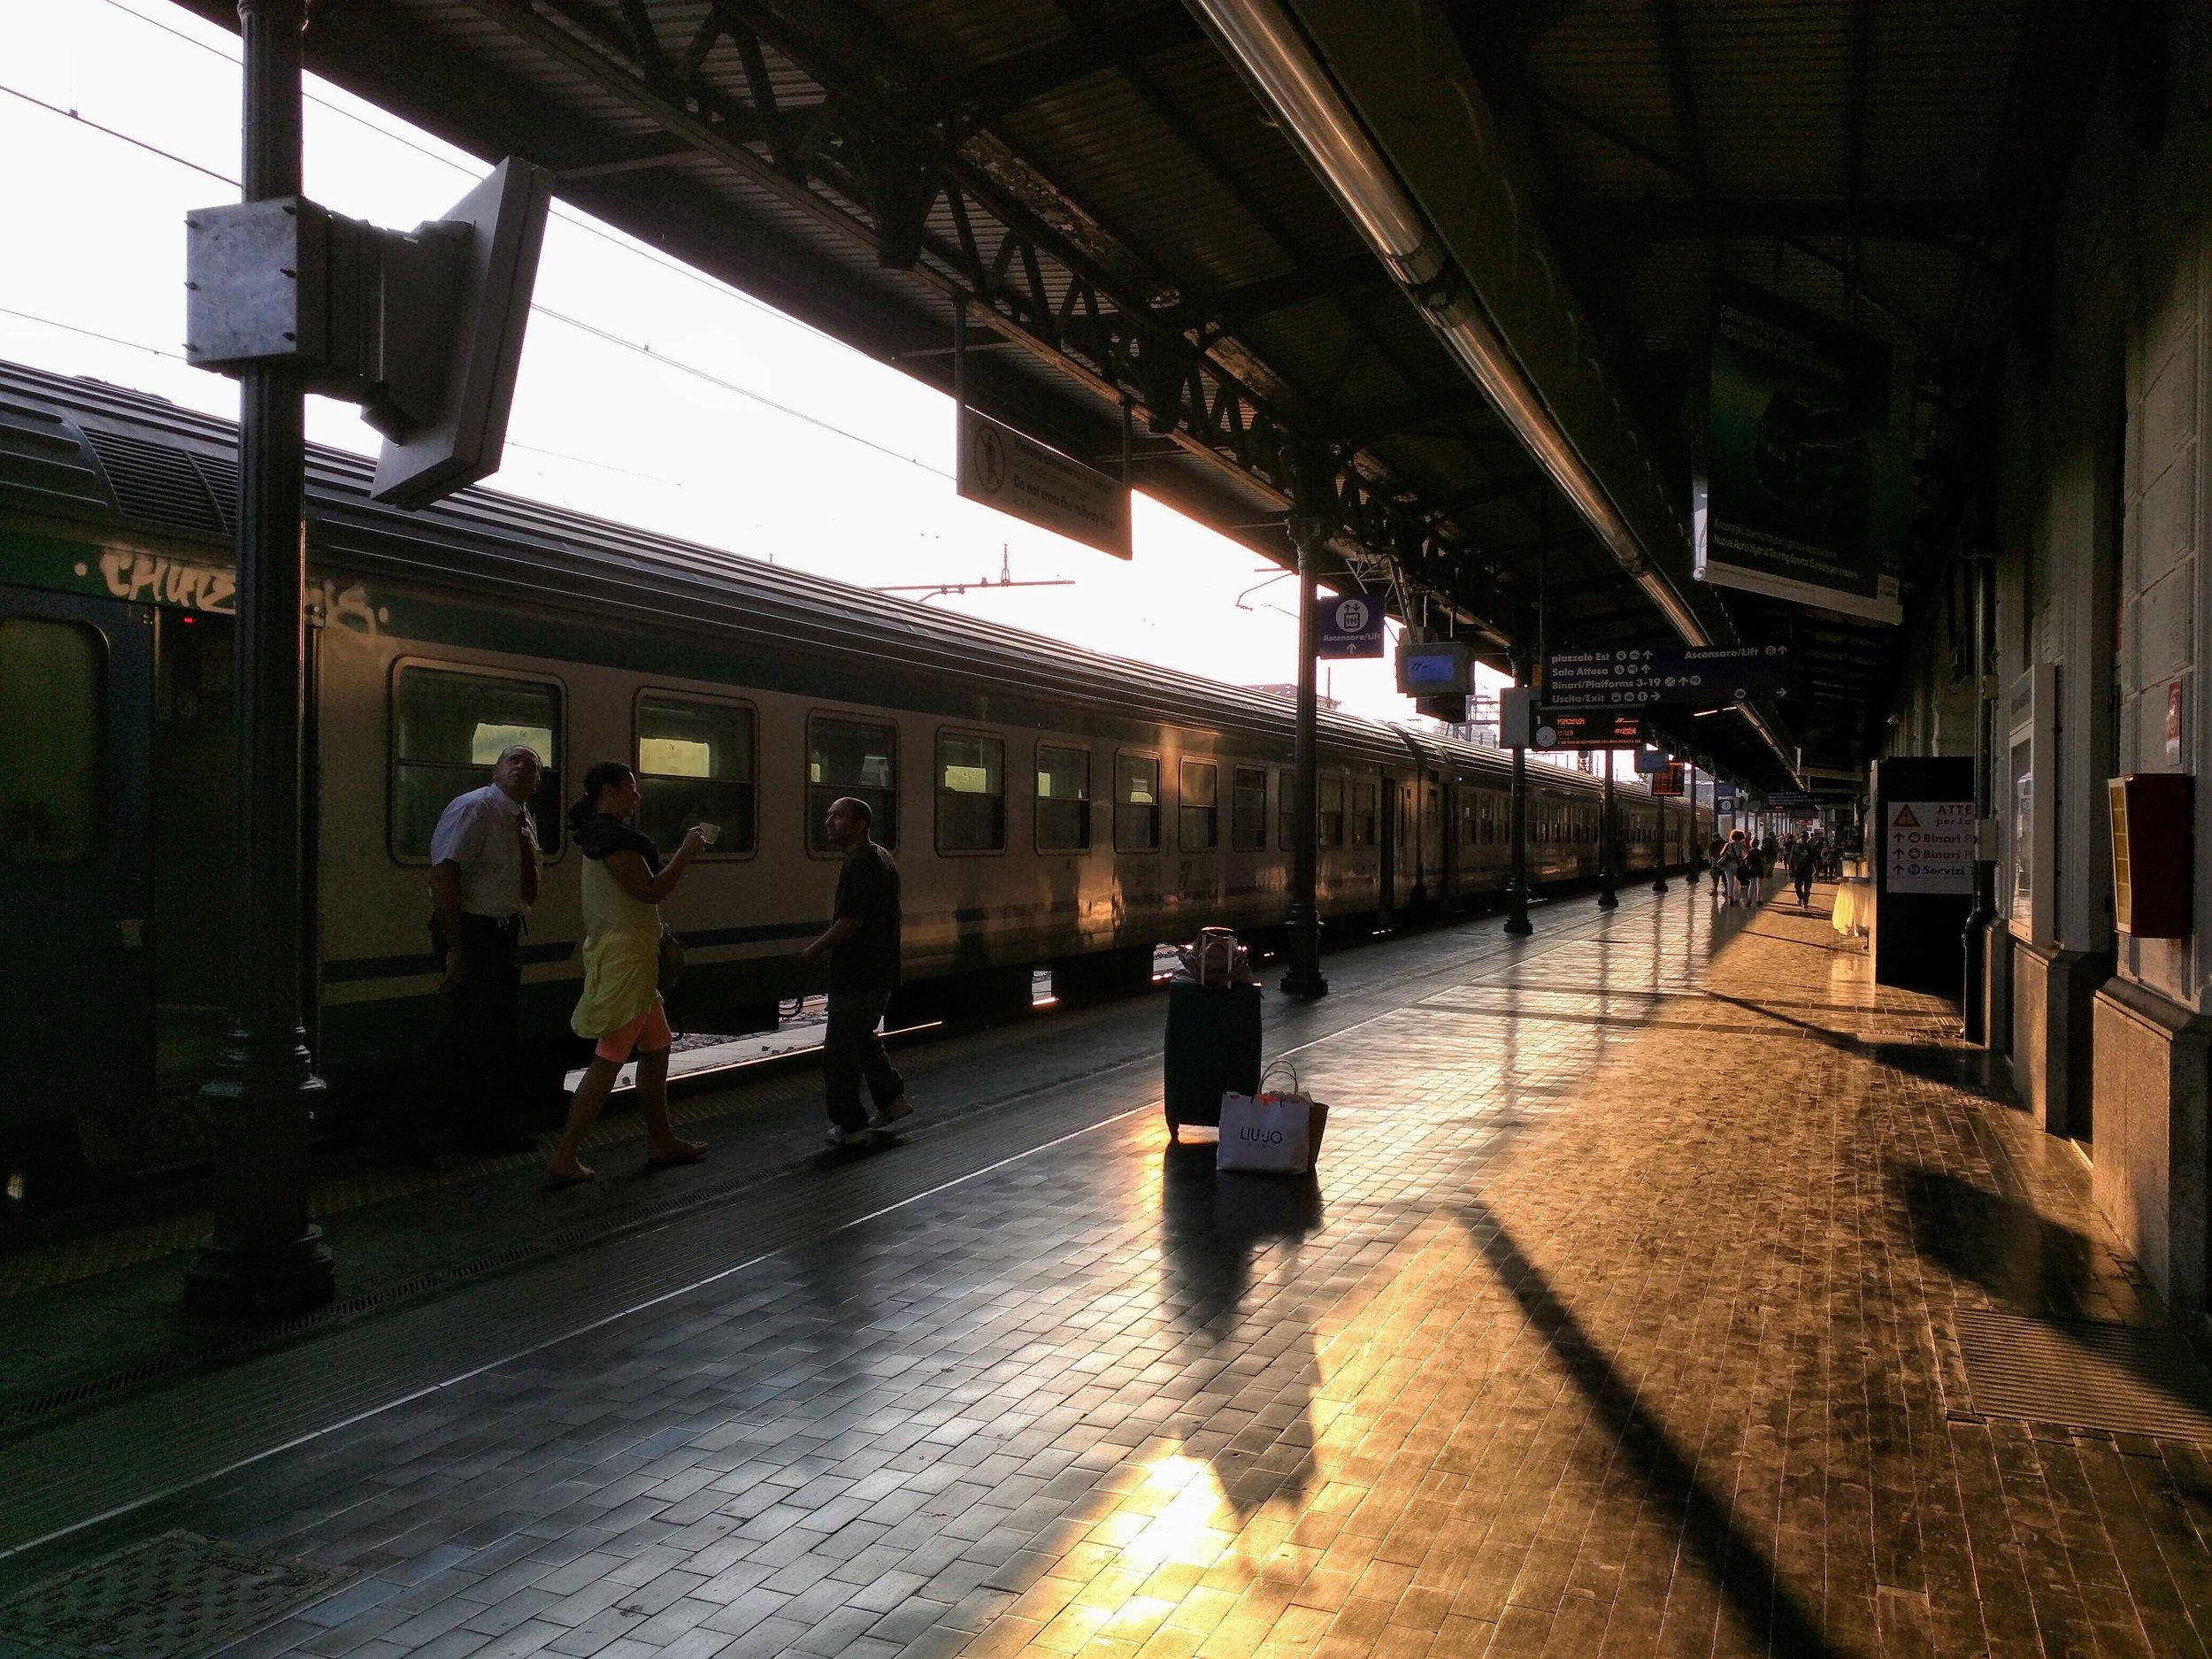 Bologna Centrale Train Station